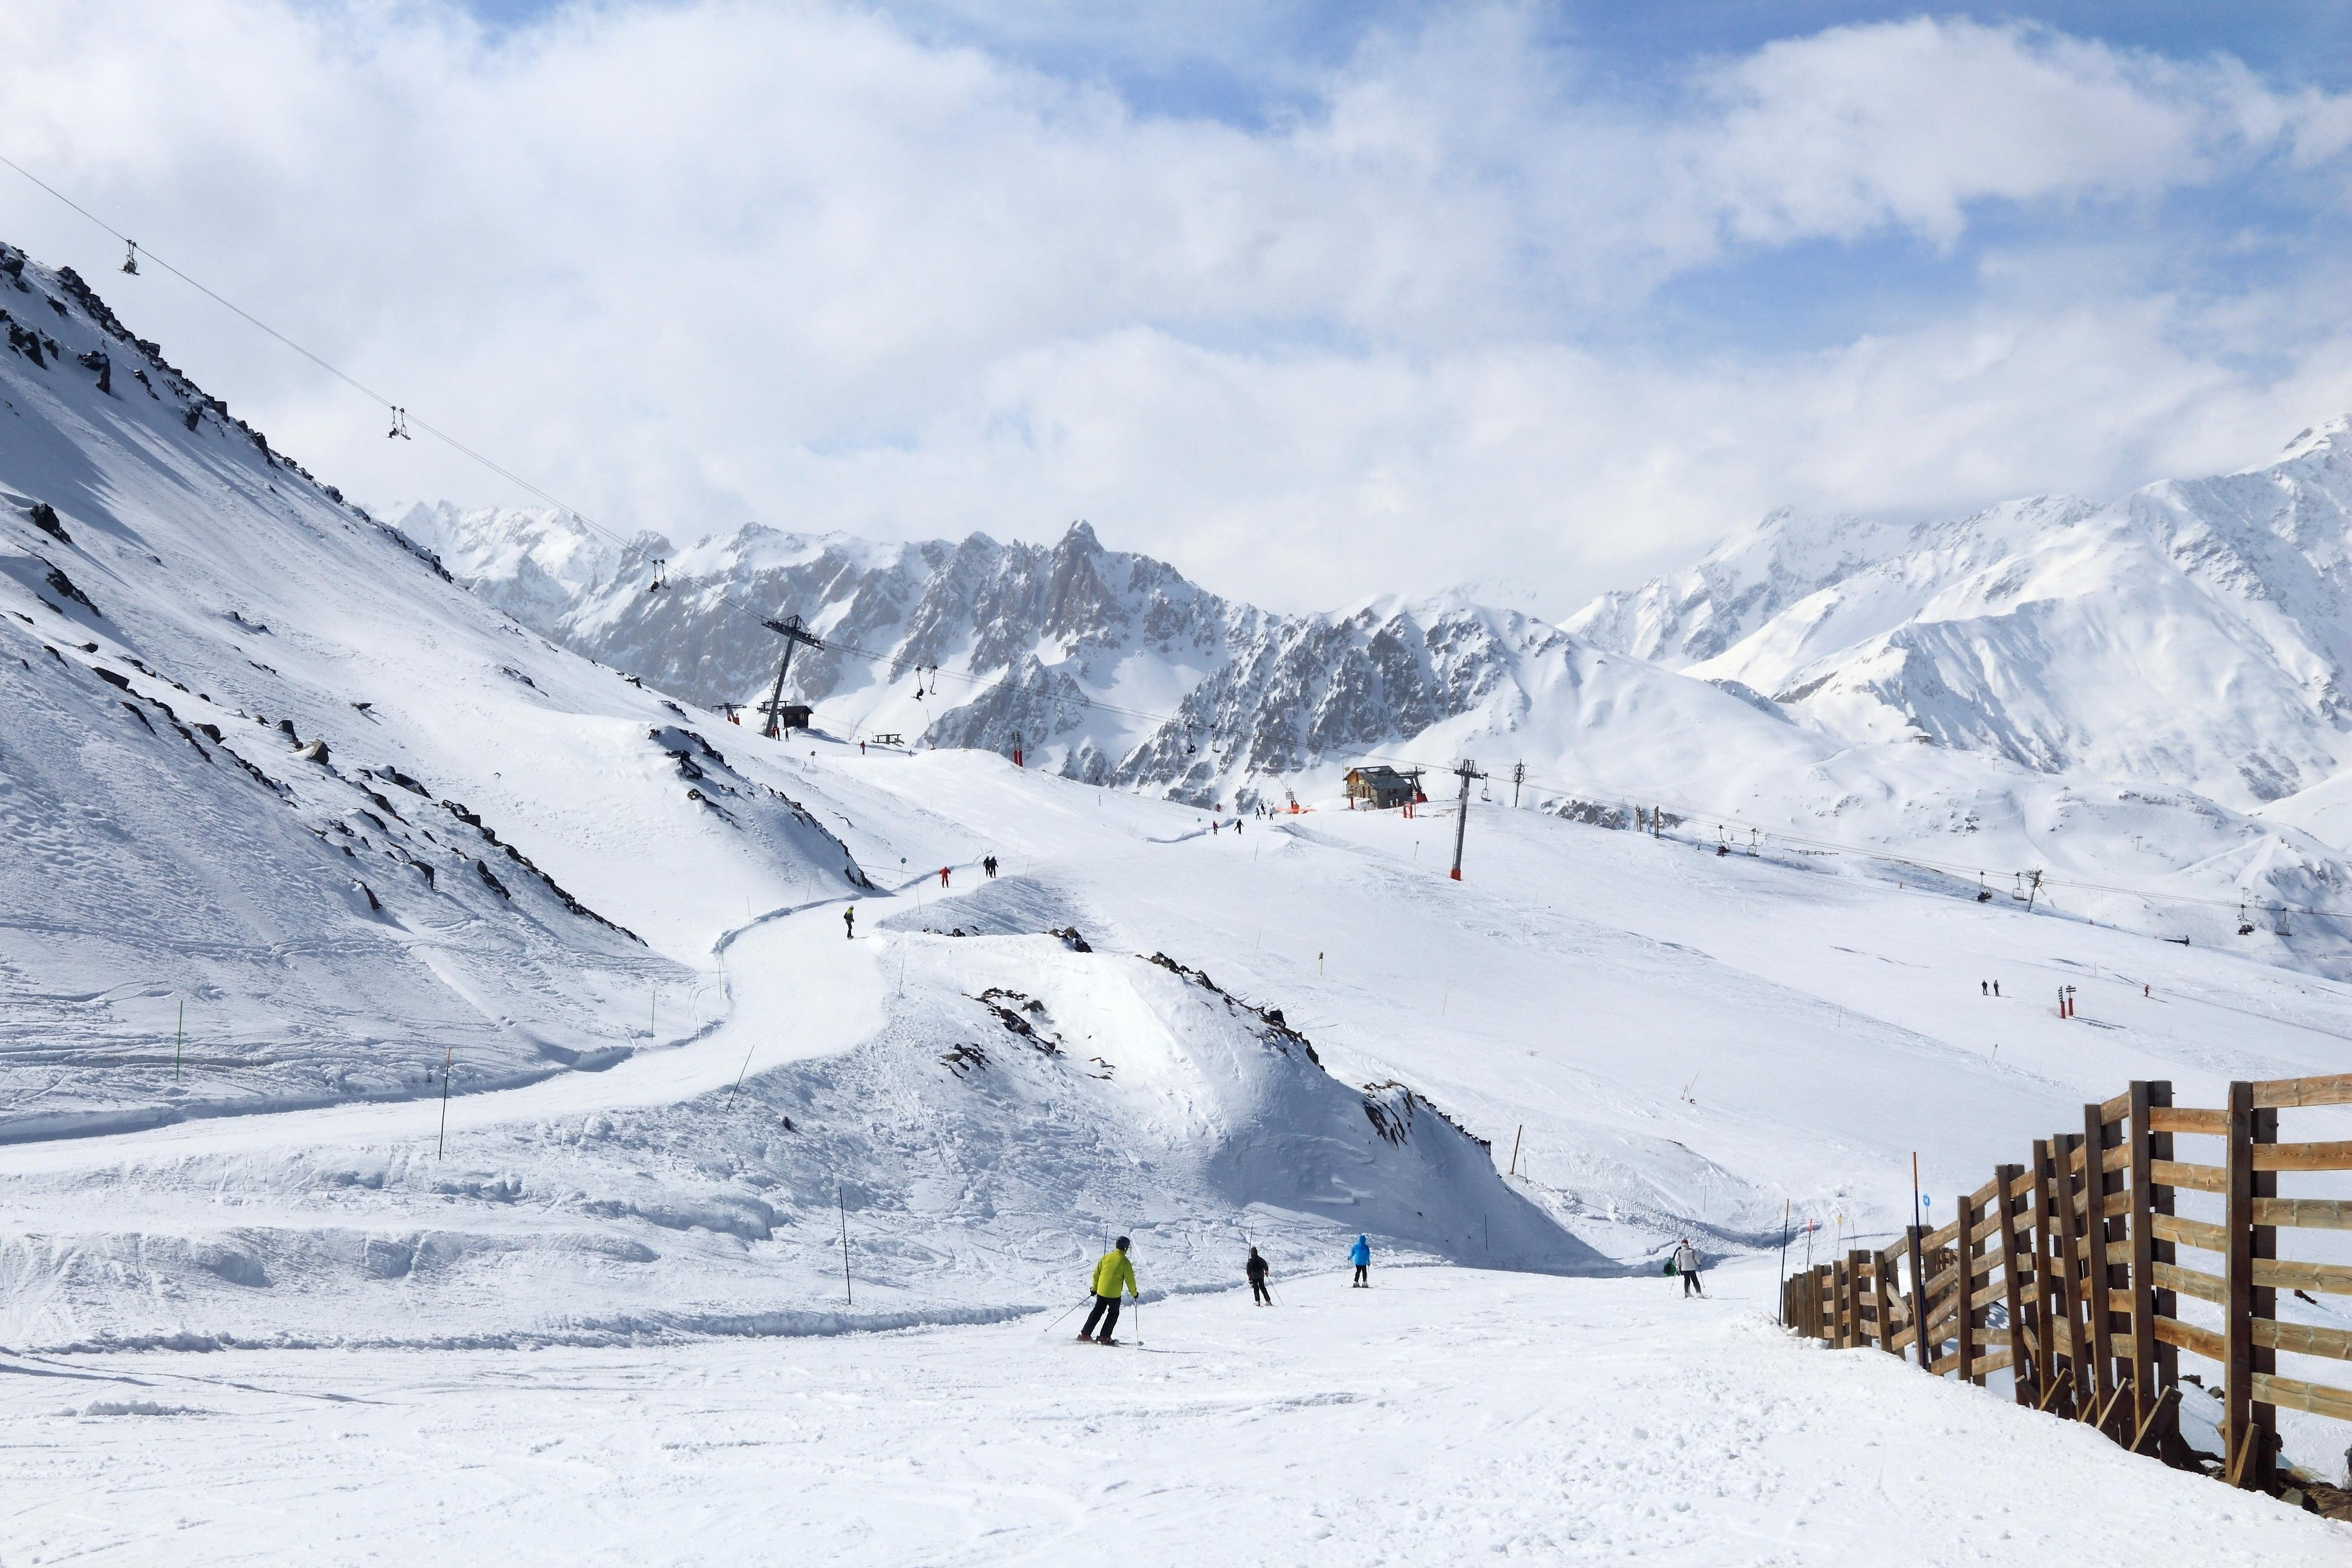 Lotus Hill Ski Resort